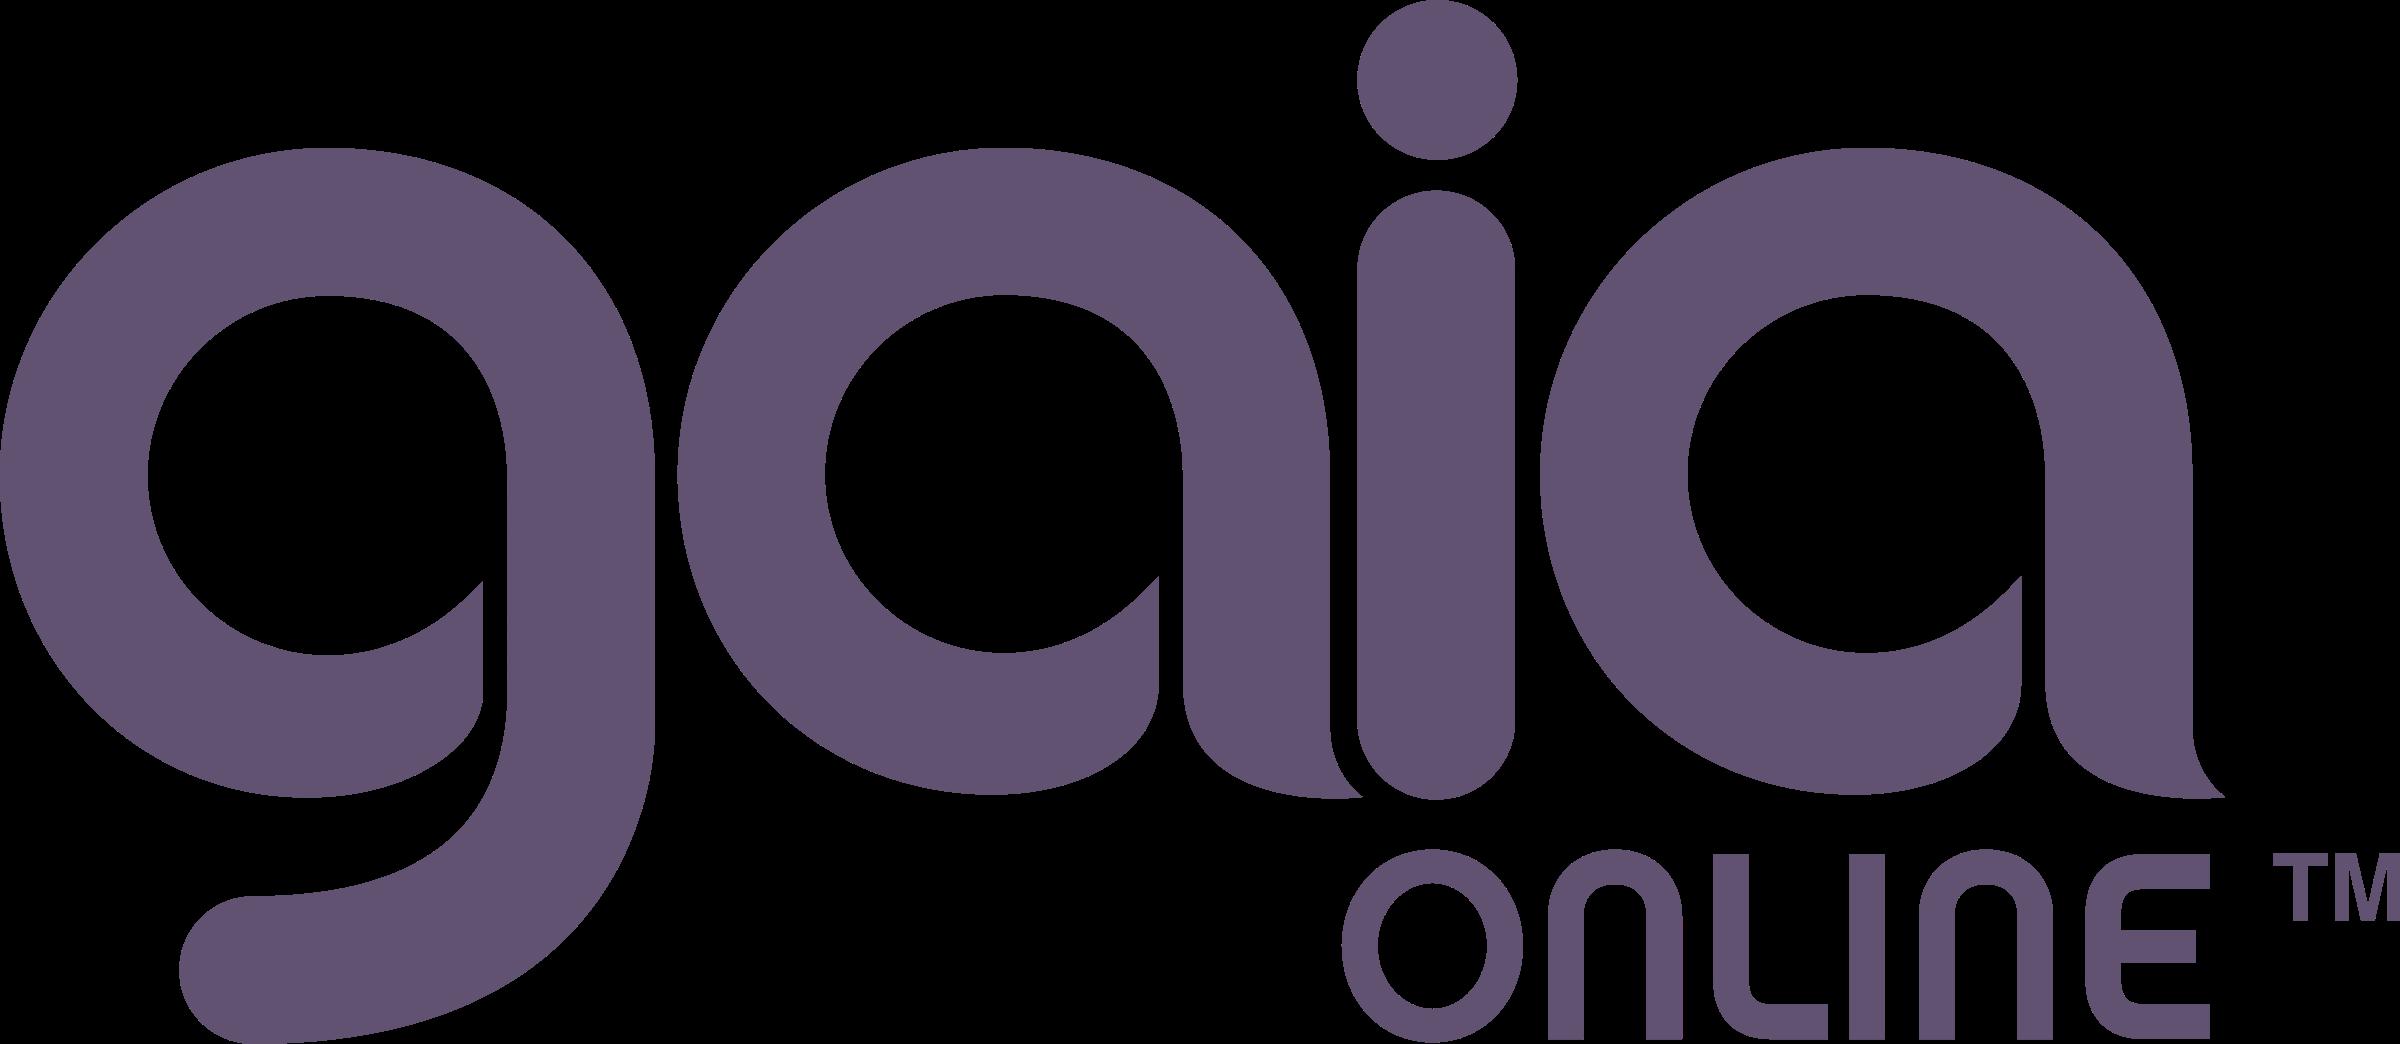 Gaia Online Logo PNG Transparent & SVG Vector.